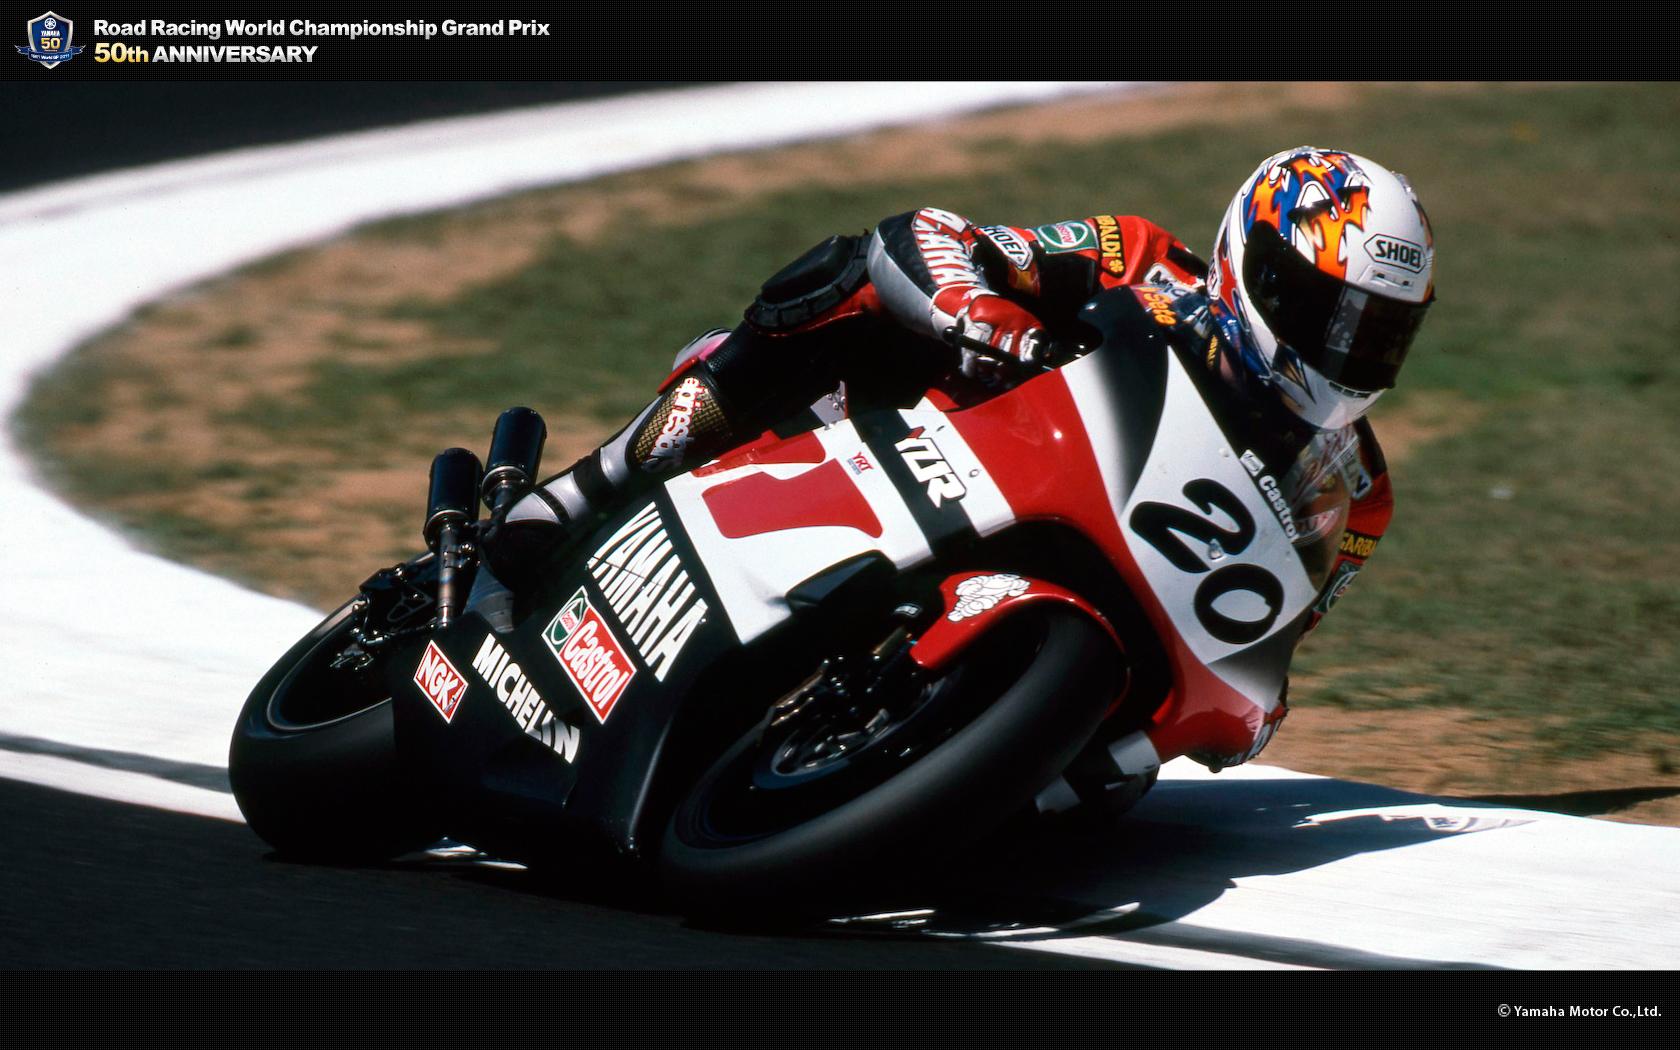 Sete Gibernau - Racing Information | Yamaha Motor Co., Ltd.